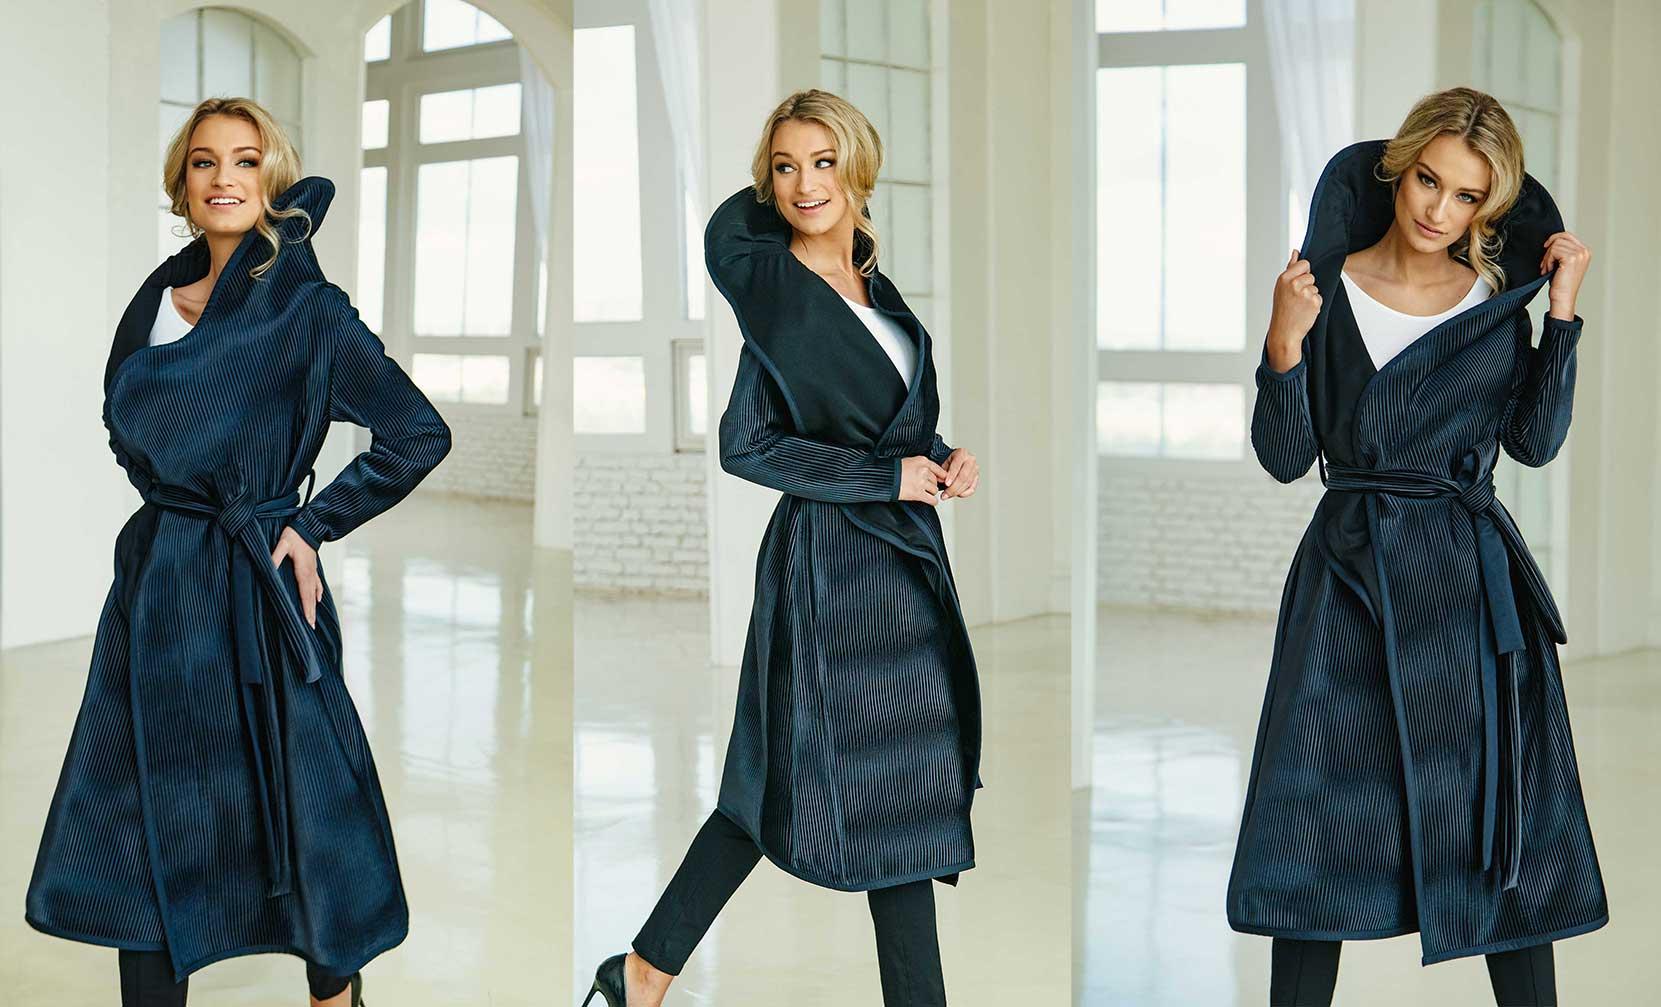 Kabát AnnA kolekce 2020 #chytramoda